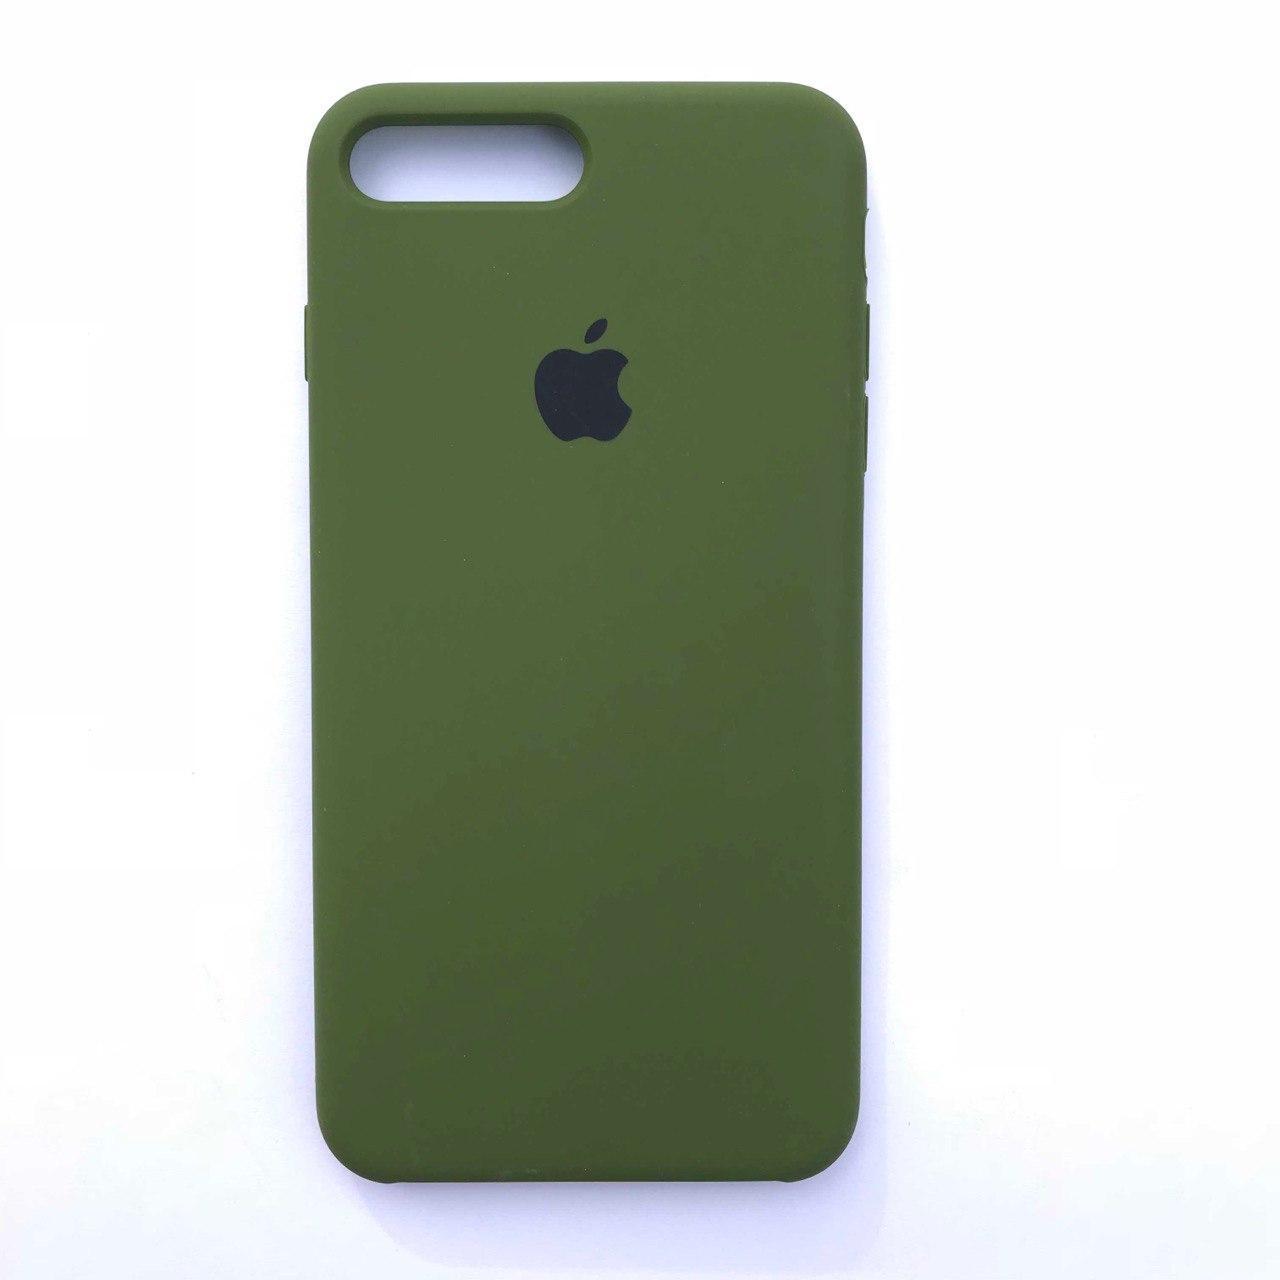 Чехол-накладка Silicone Case для Apple iPhone 7 Plus iPhone 8 Plus Pinery Green